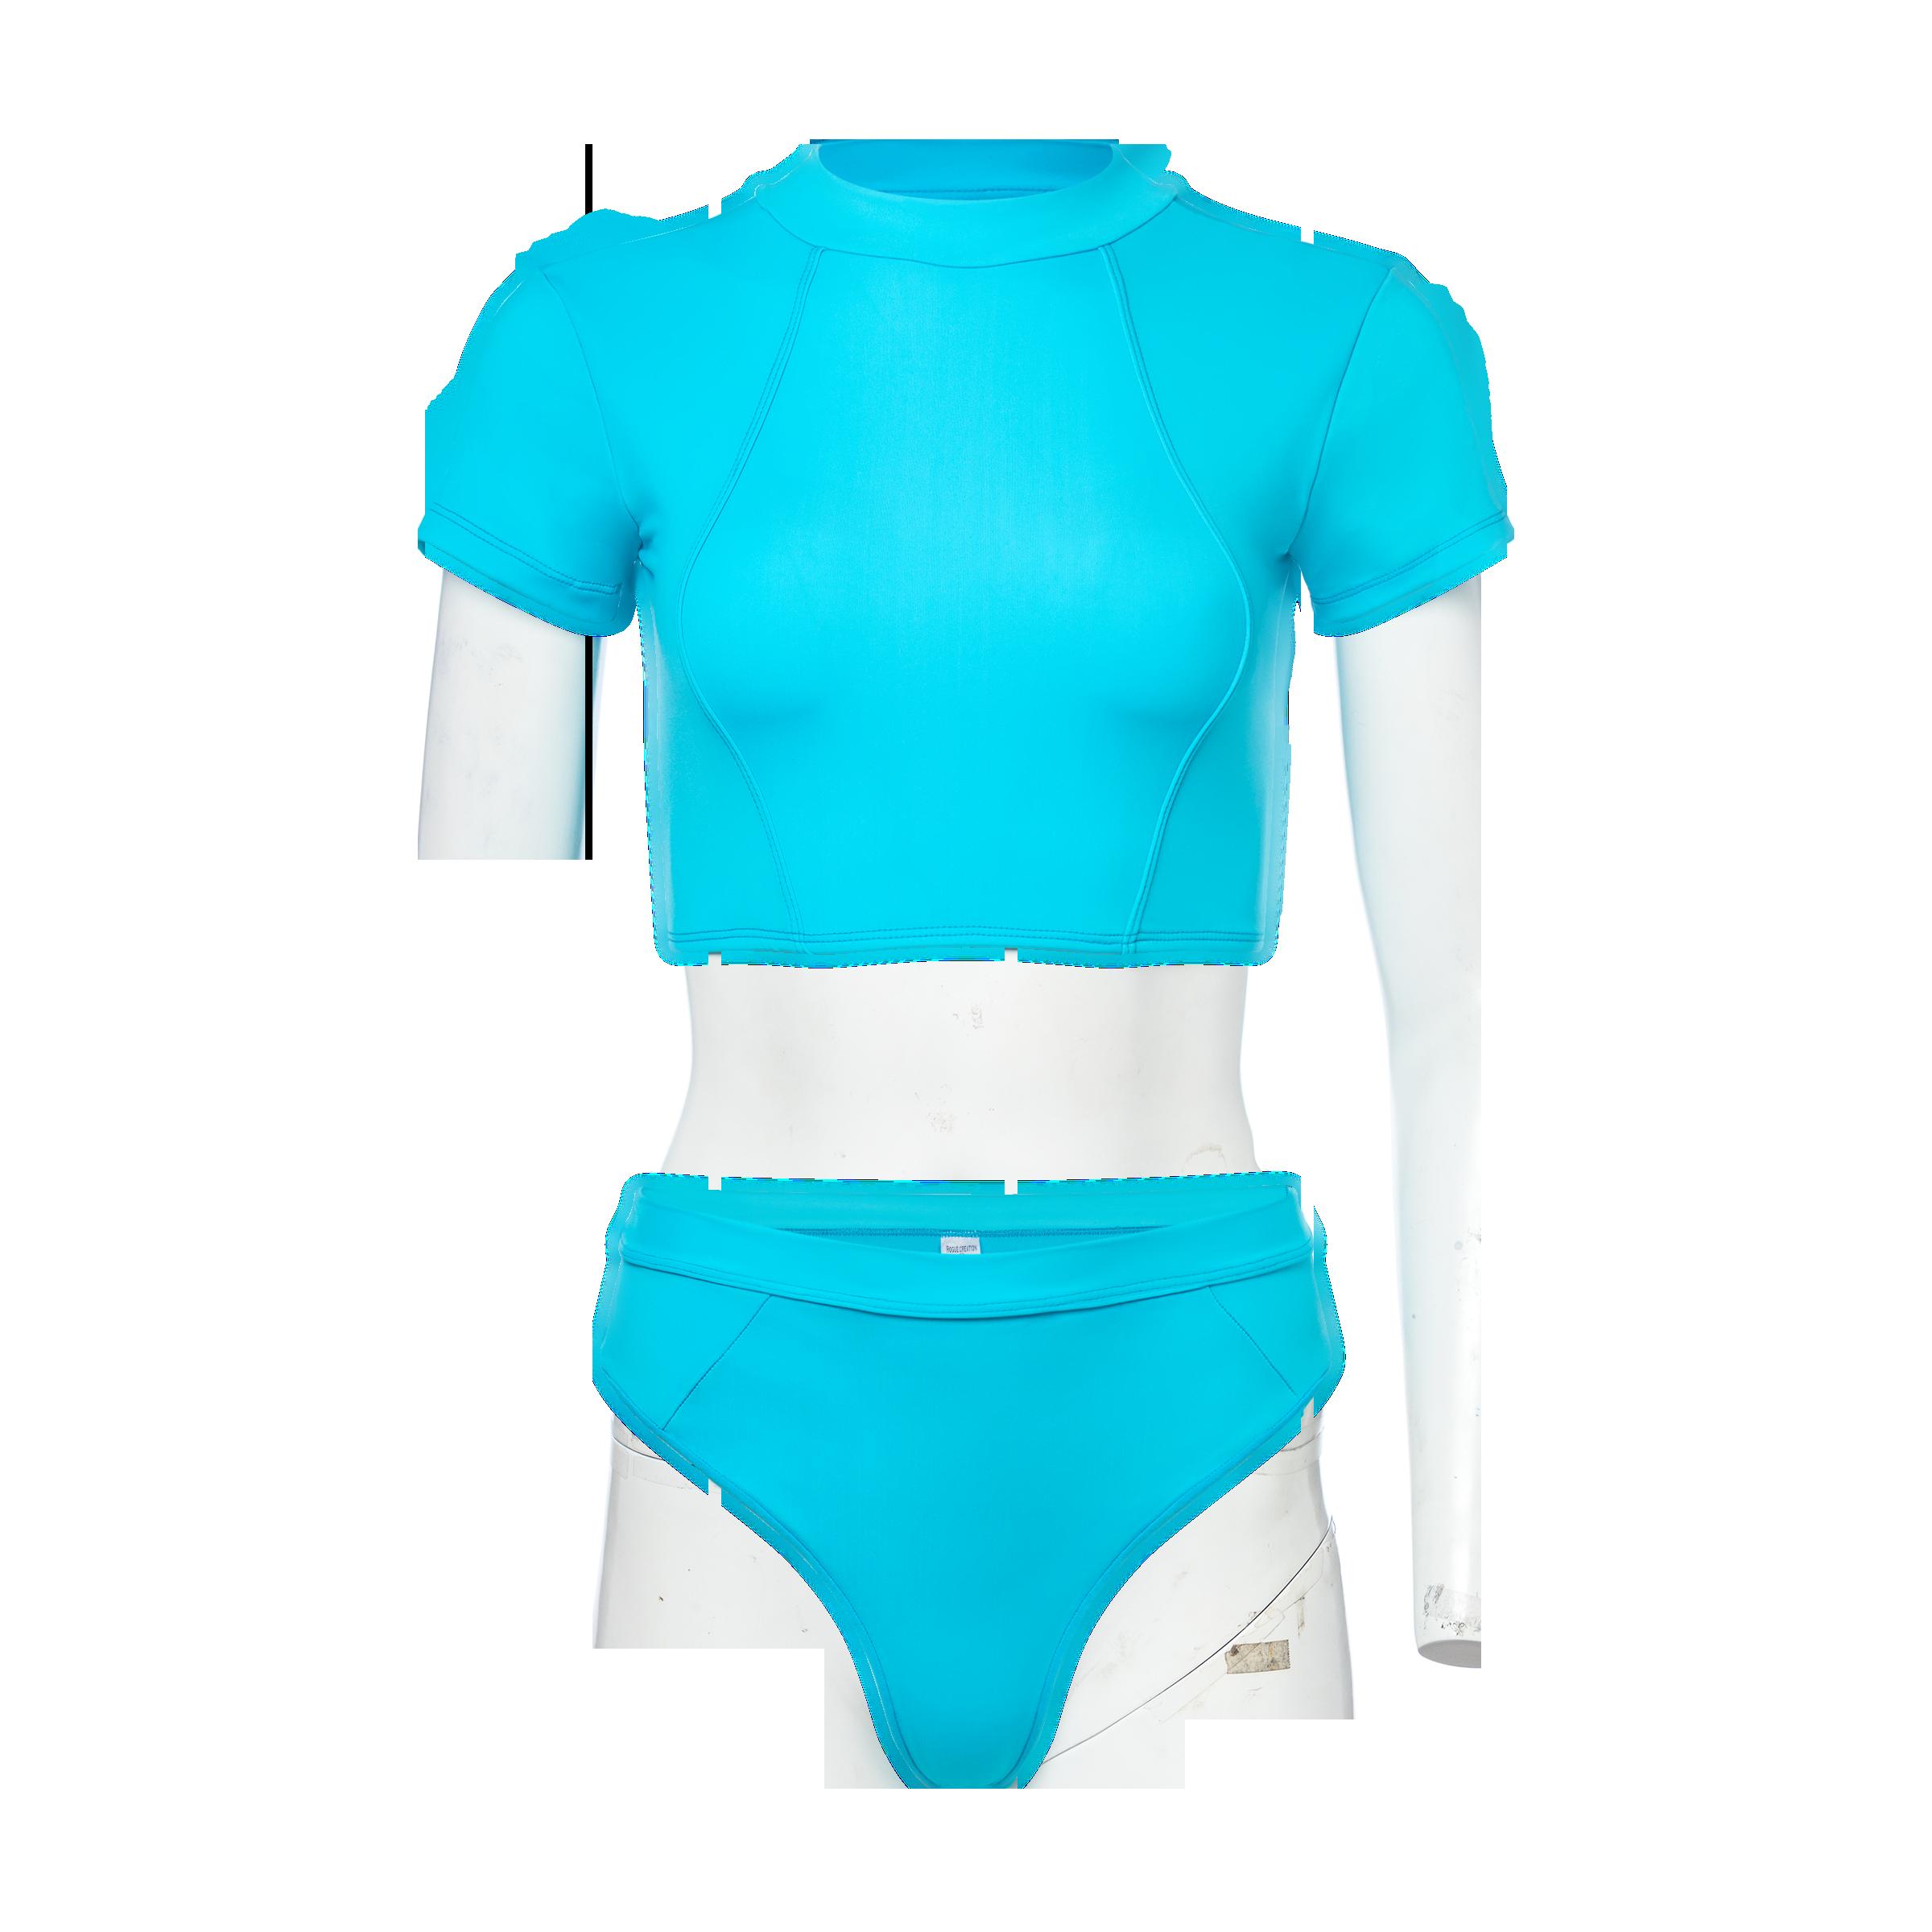 blue Swimsuit product photo